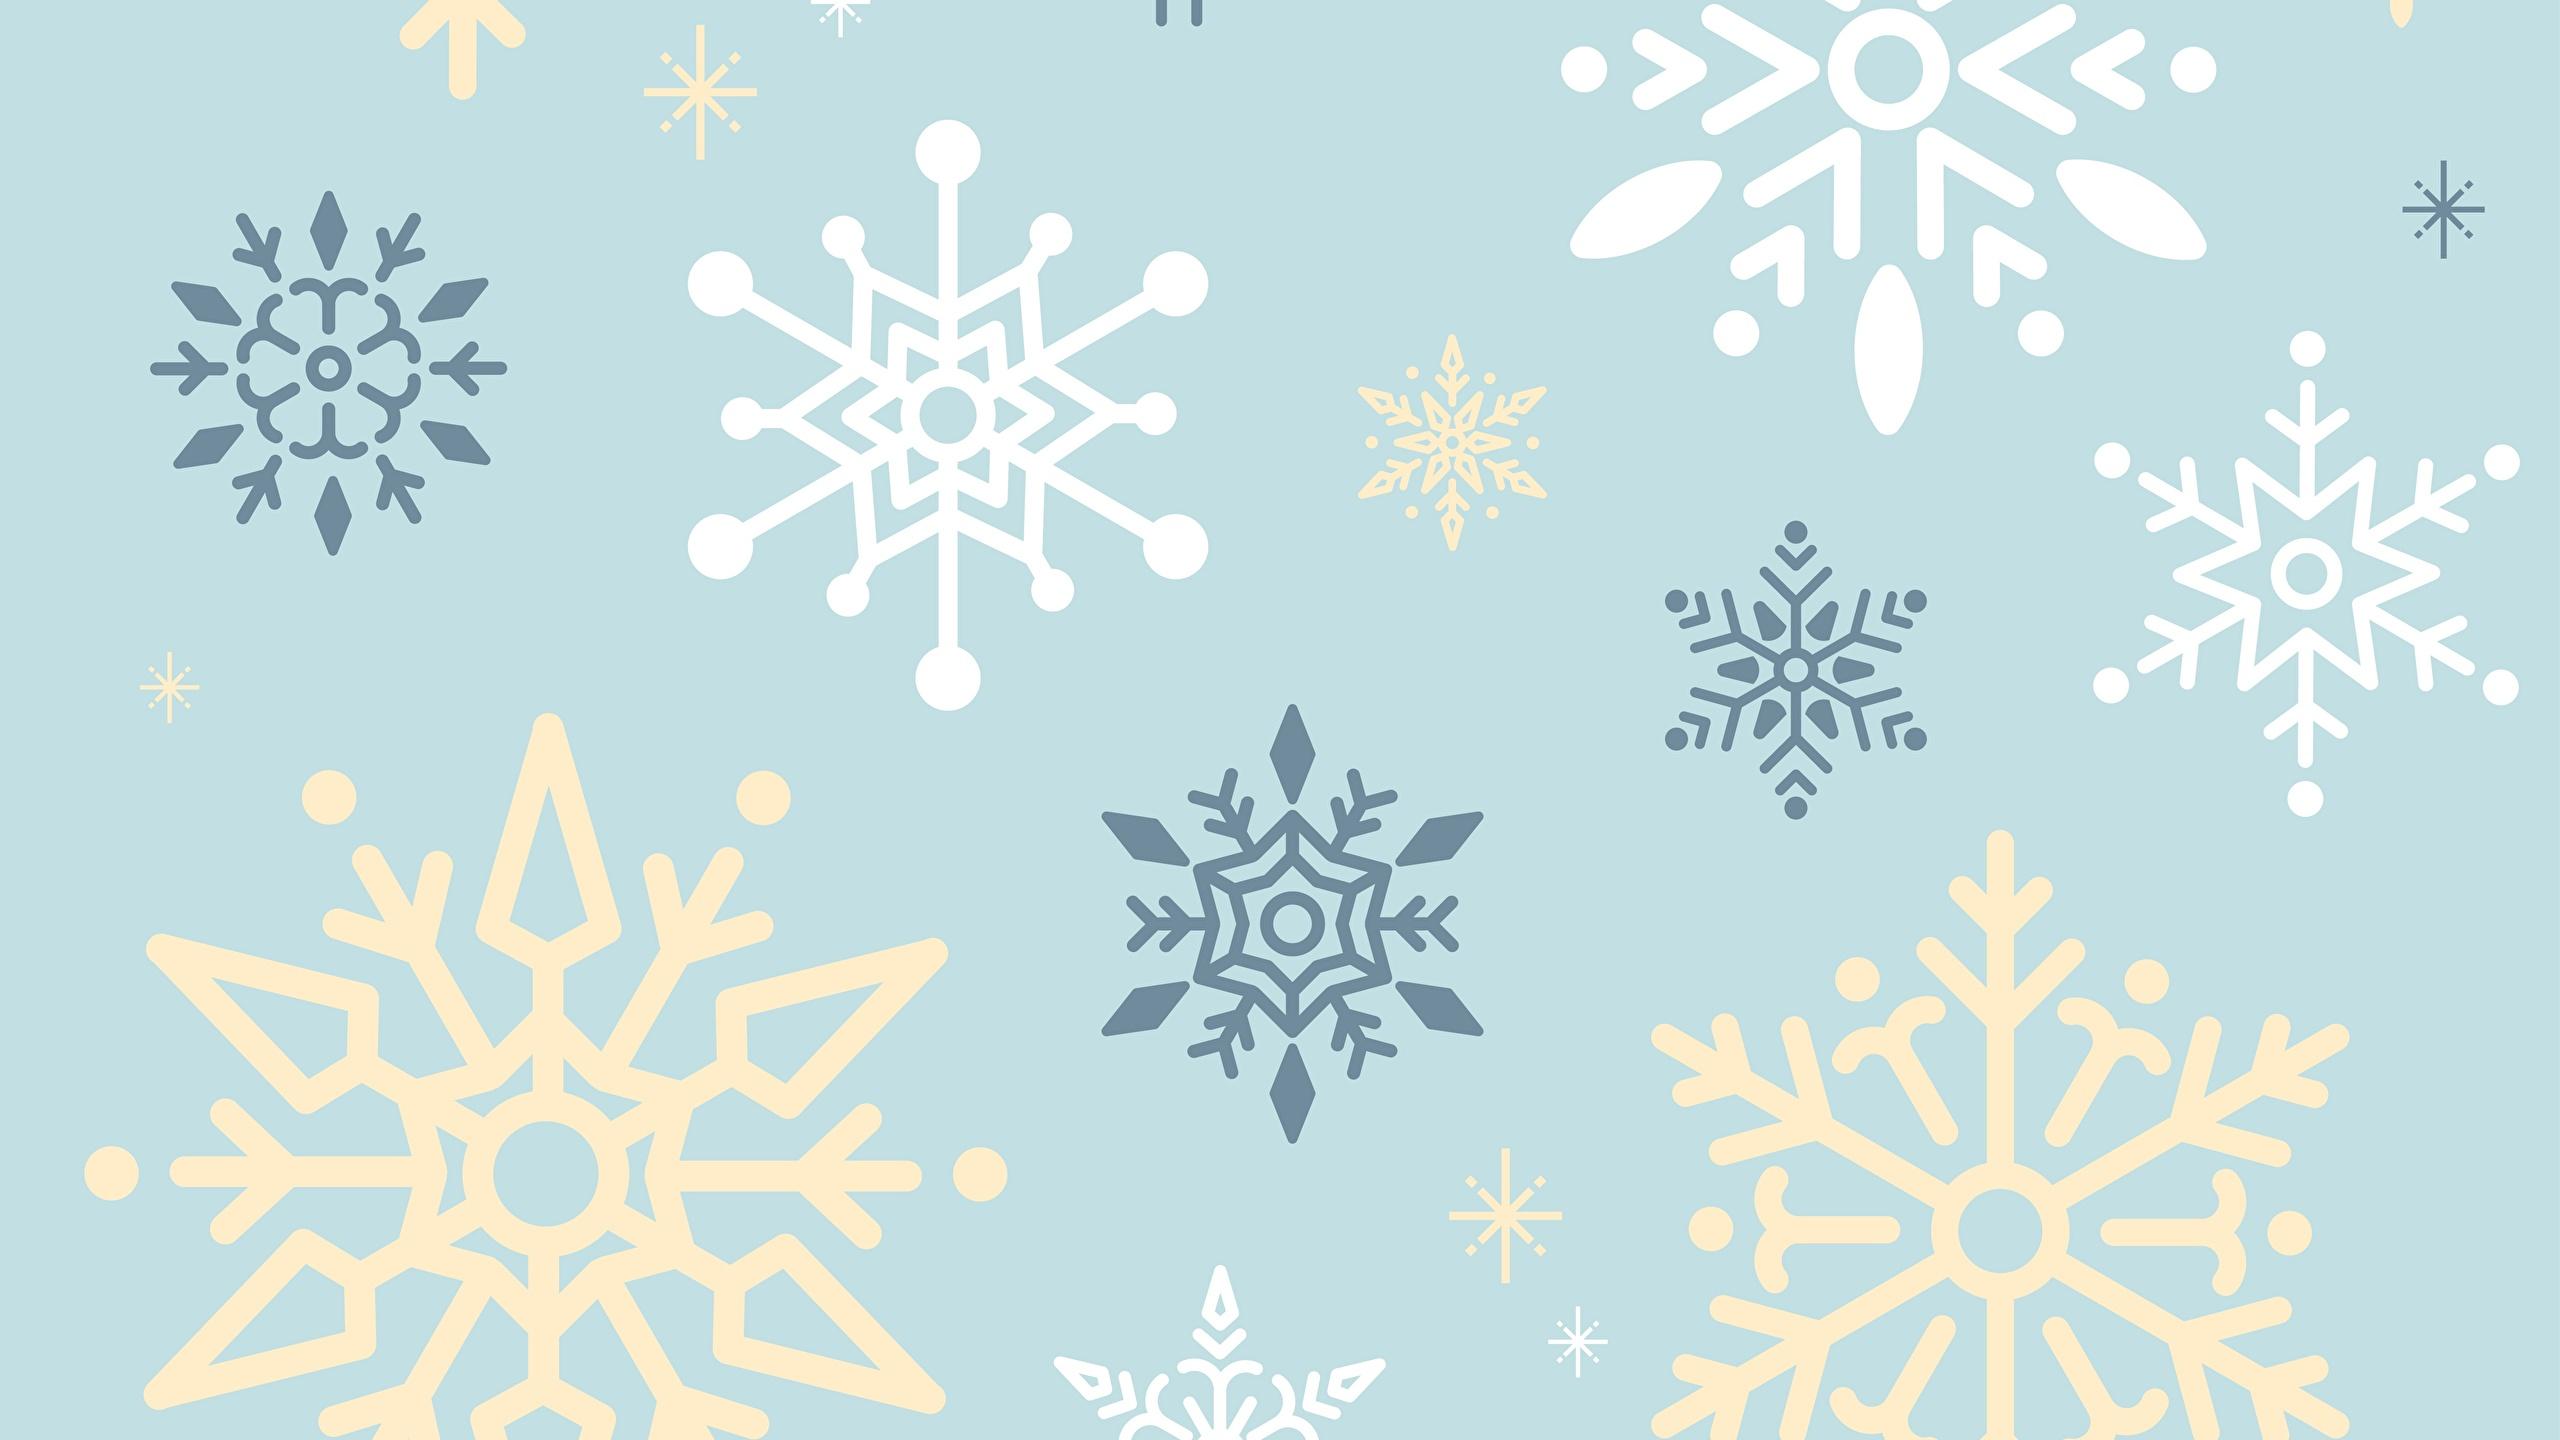 Фотографии Текстура снежинка 2560x1440 Снежинки